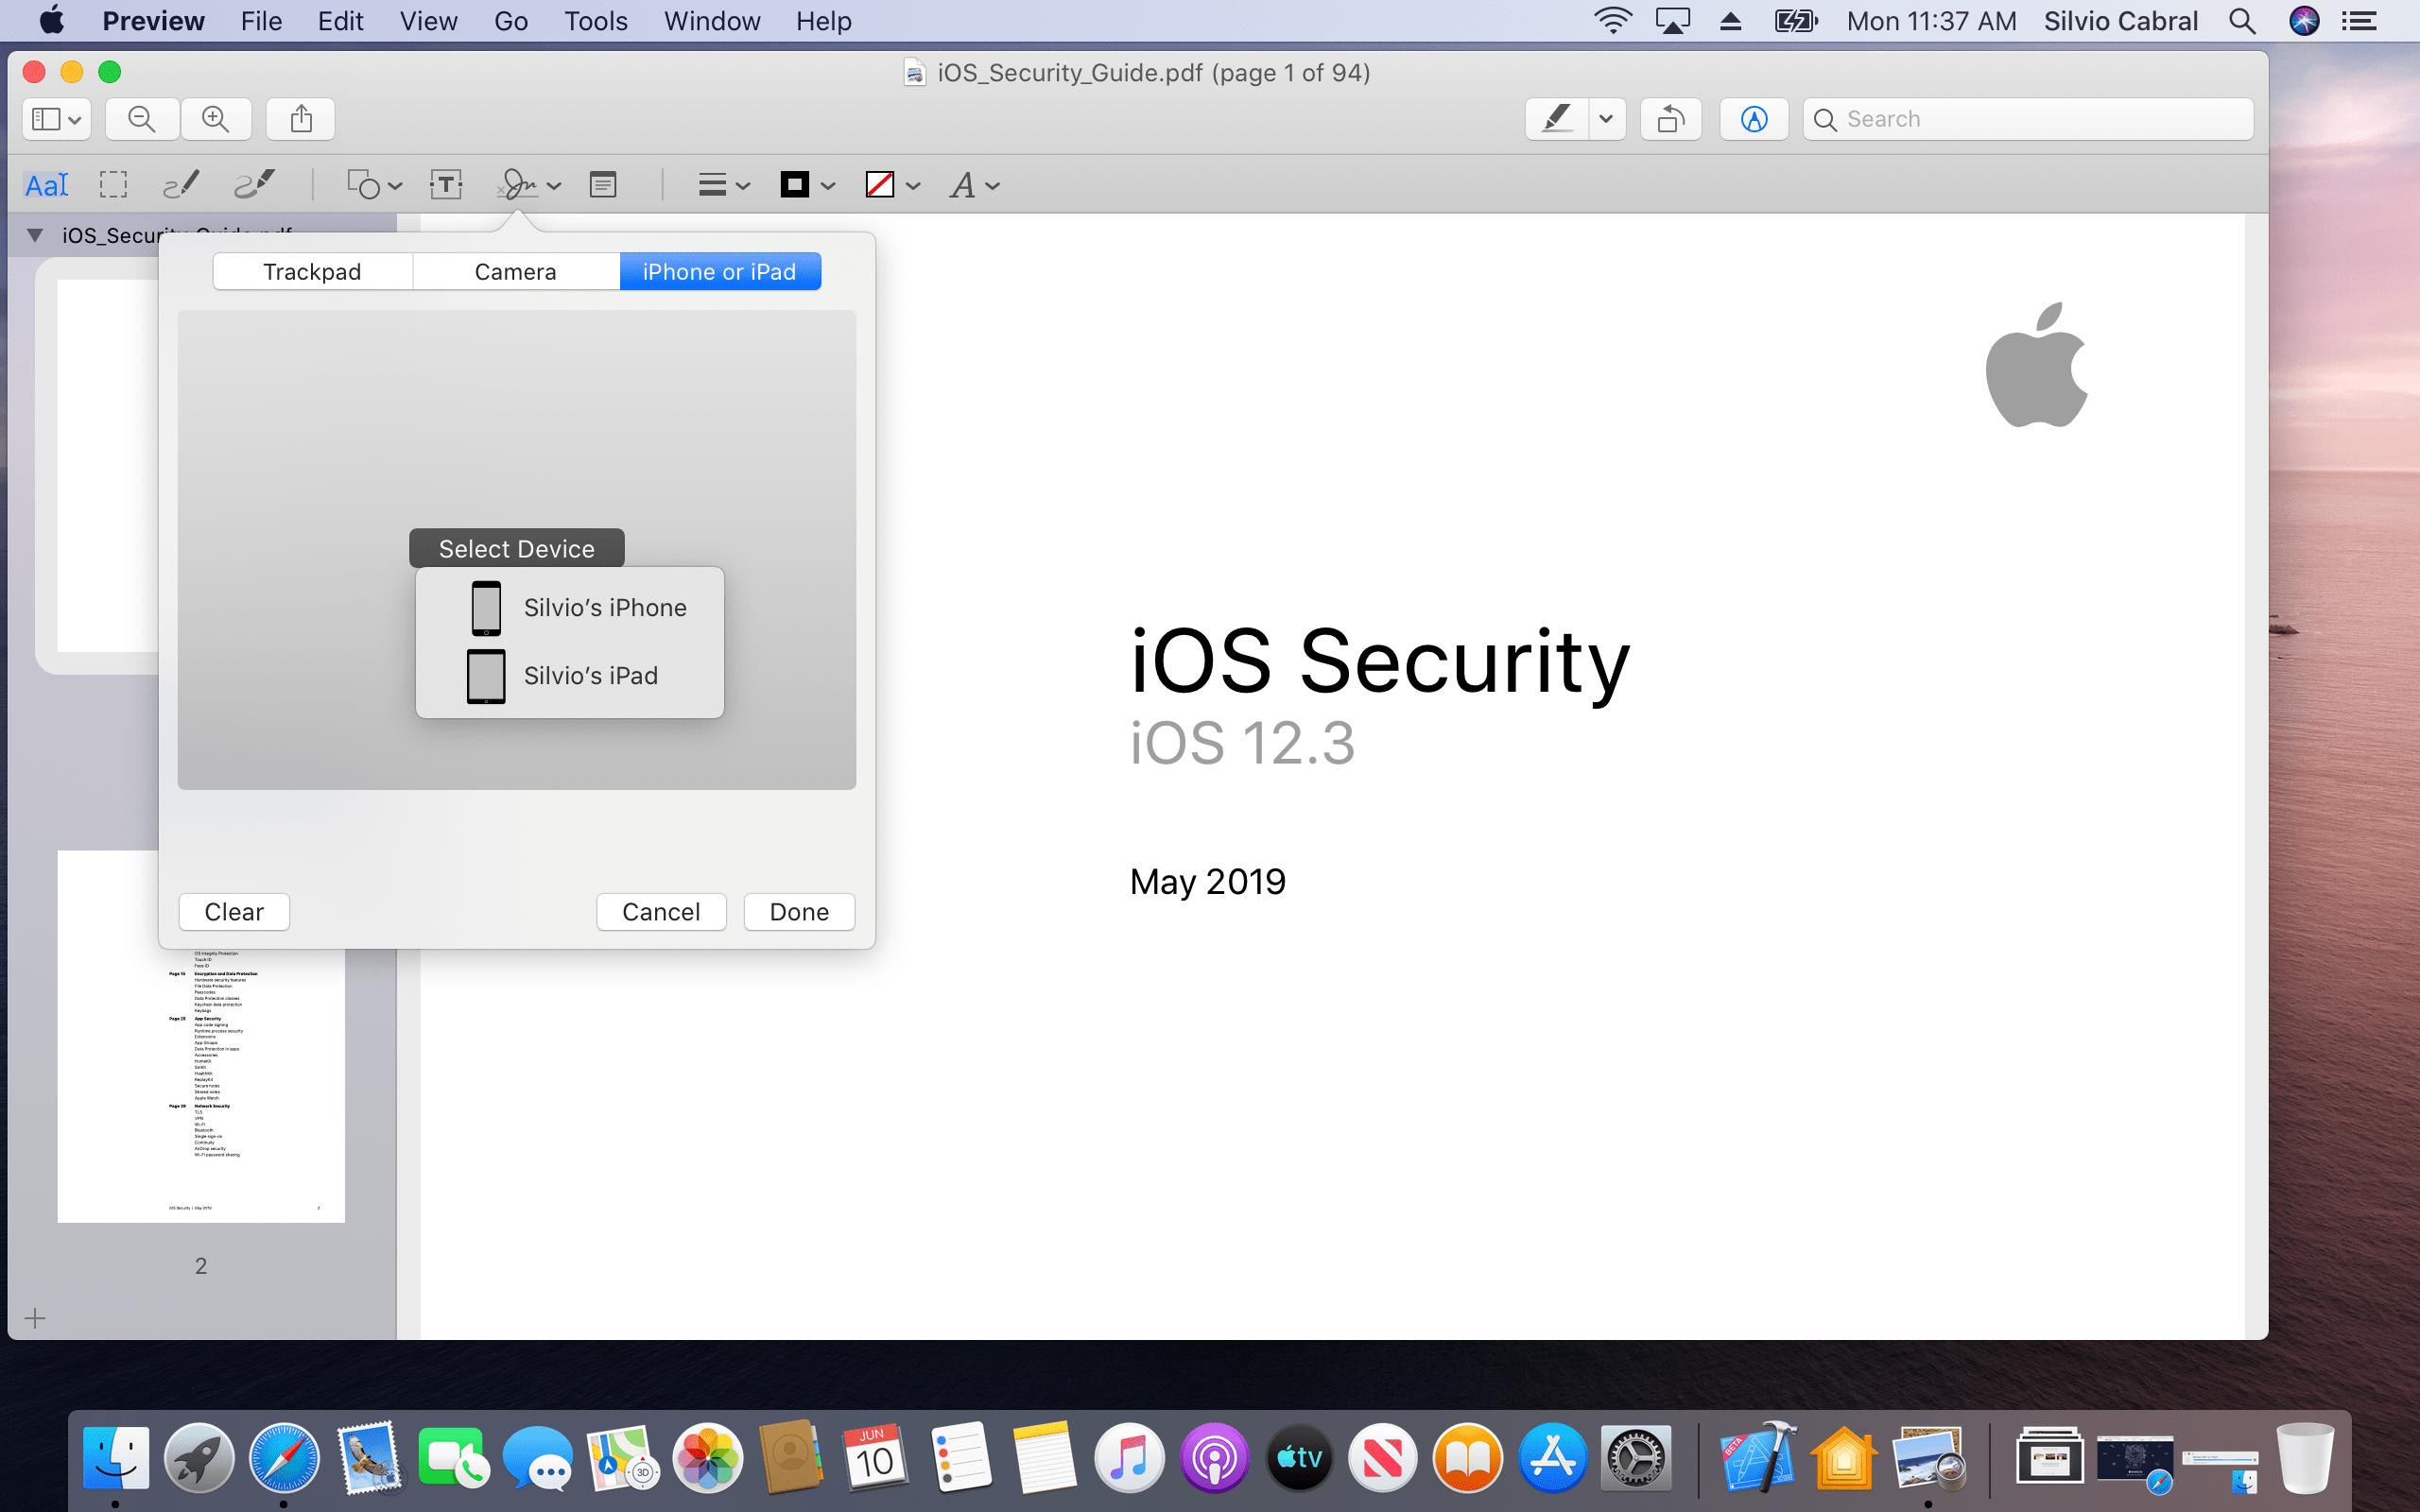 Assinando PDFs no macOS Catalina